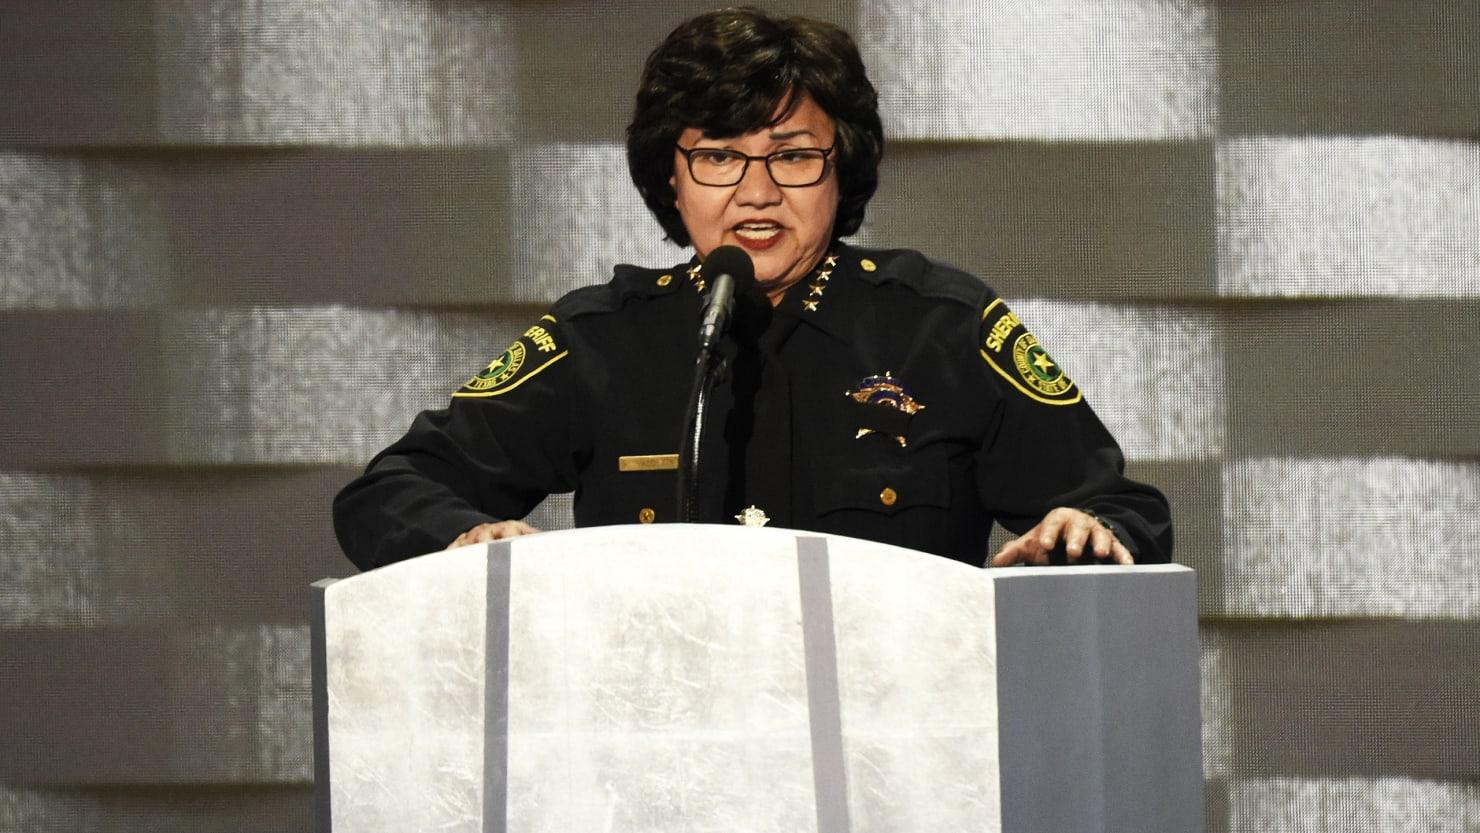 Lesbian Sheriff Lupe Valdez Is Out to Beat Anti-LGBT Texas Gov. Greg Abbott